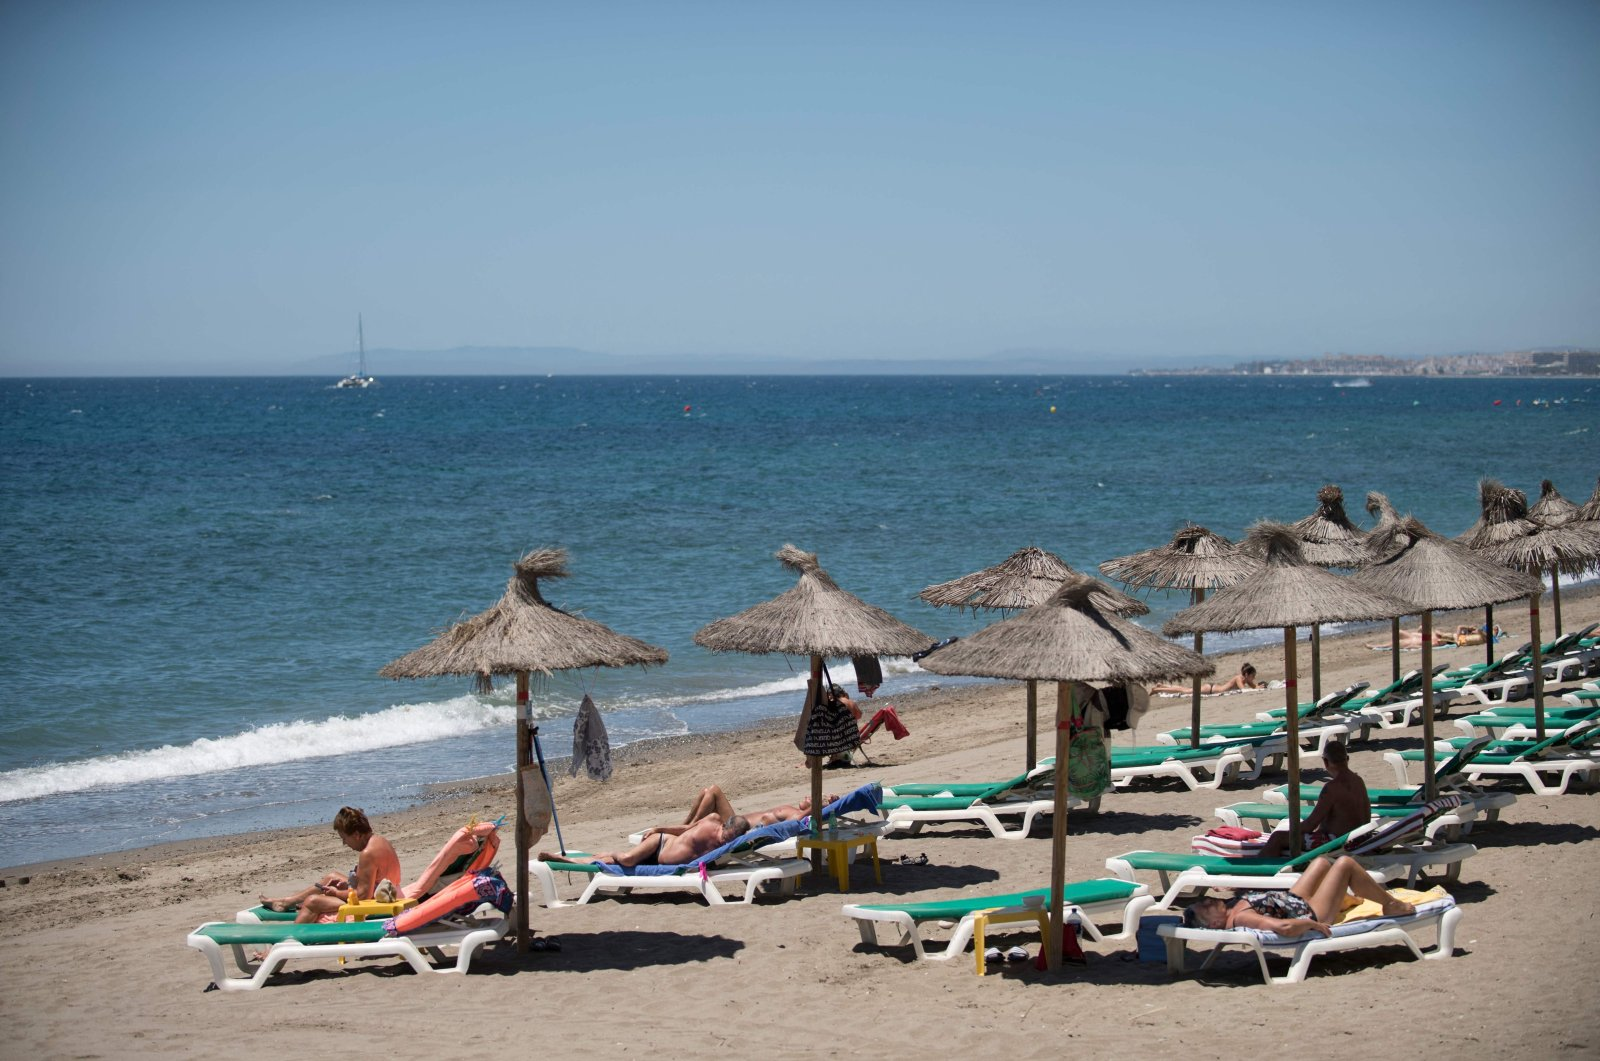 Tourists sunbathe at Marbella beach, in Marbella, Spain, June 7, 2021. (AFP)